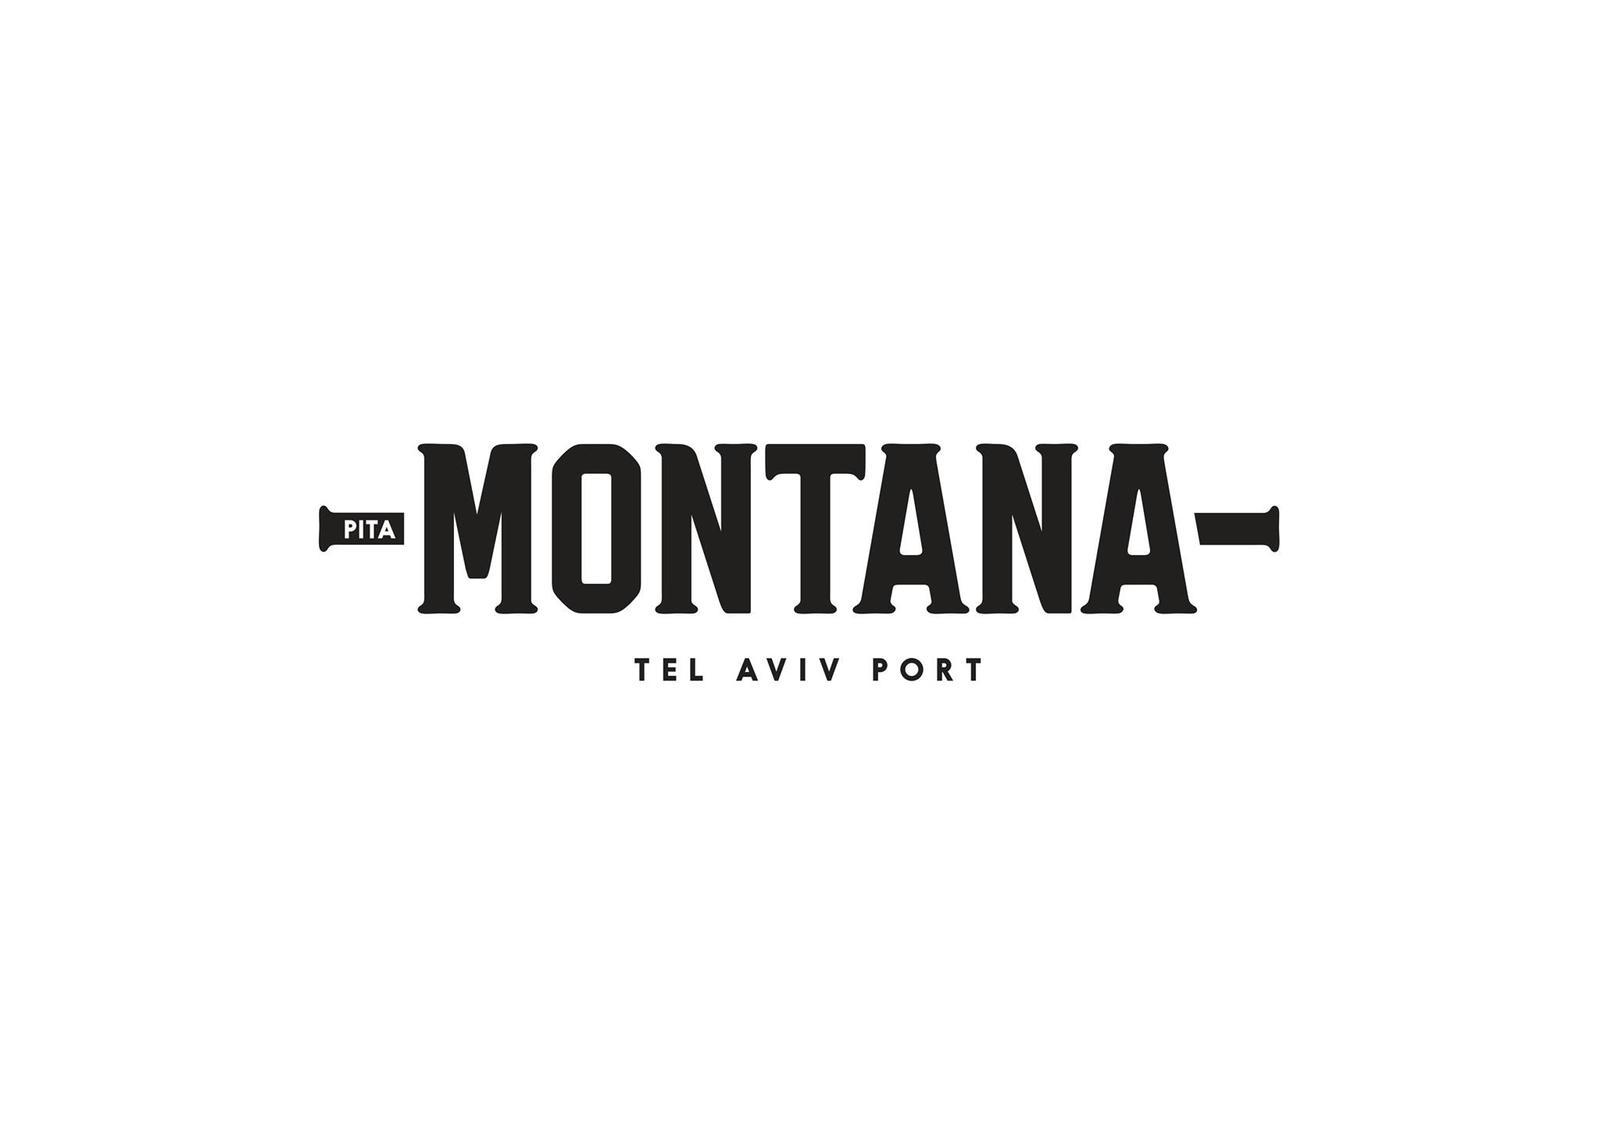 Pita Montana